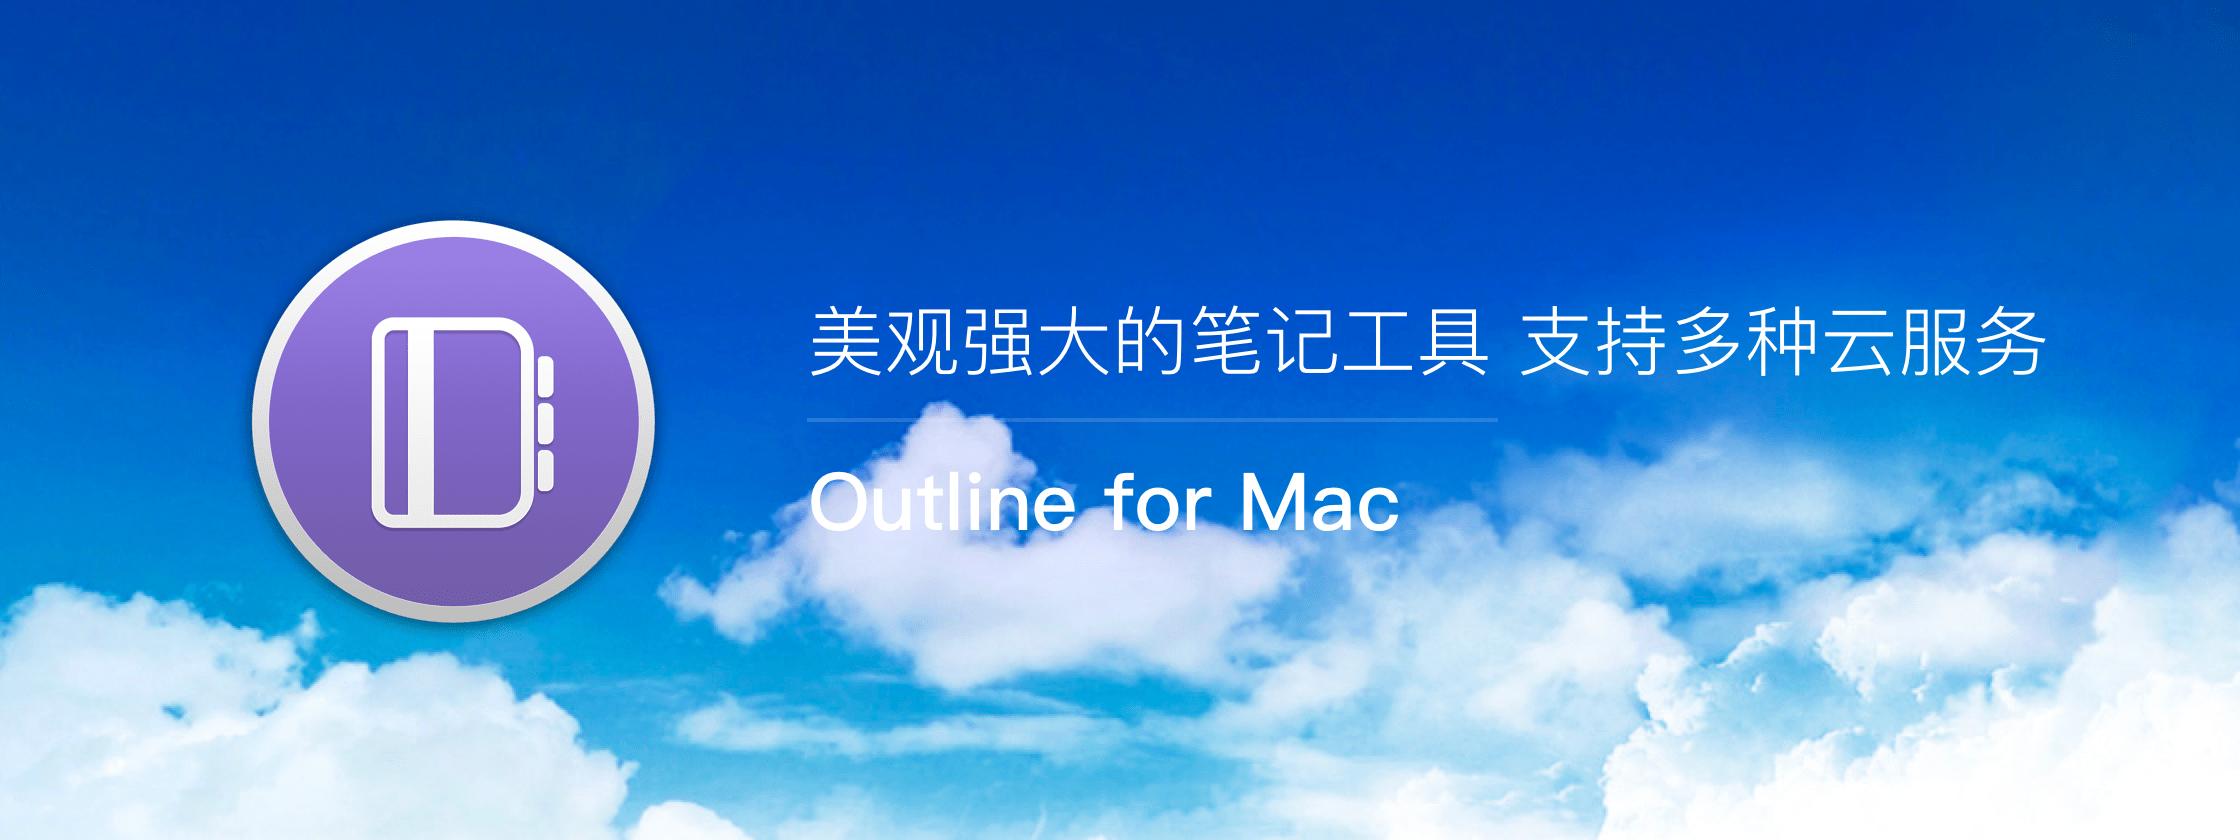 Outline,macOS 平台 美观强大的笔记工具,支持多种云服务